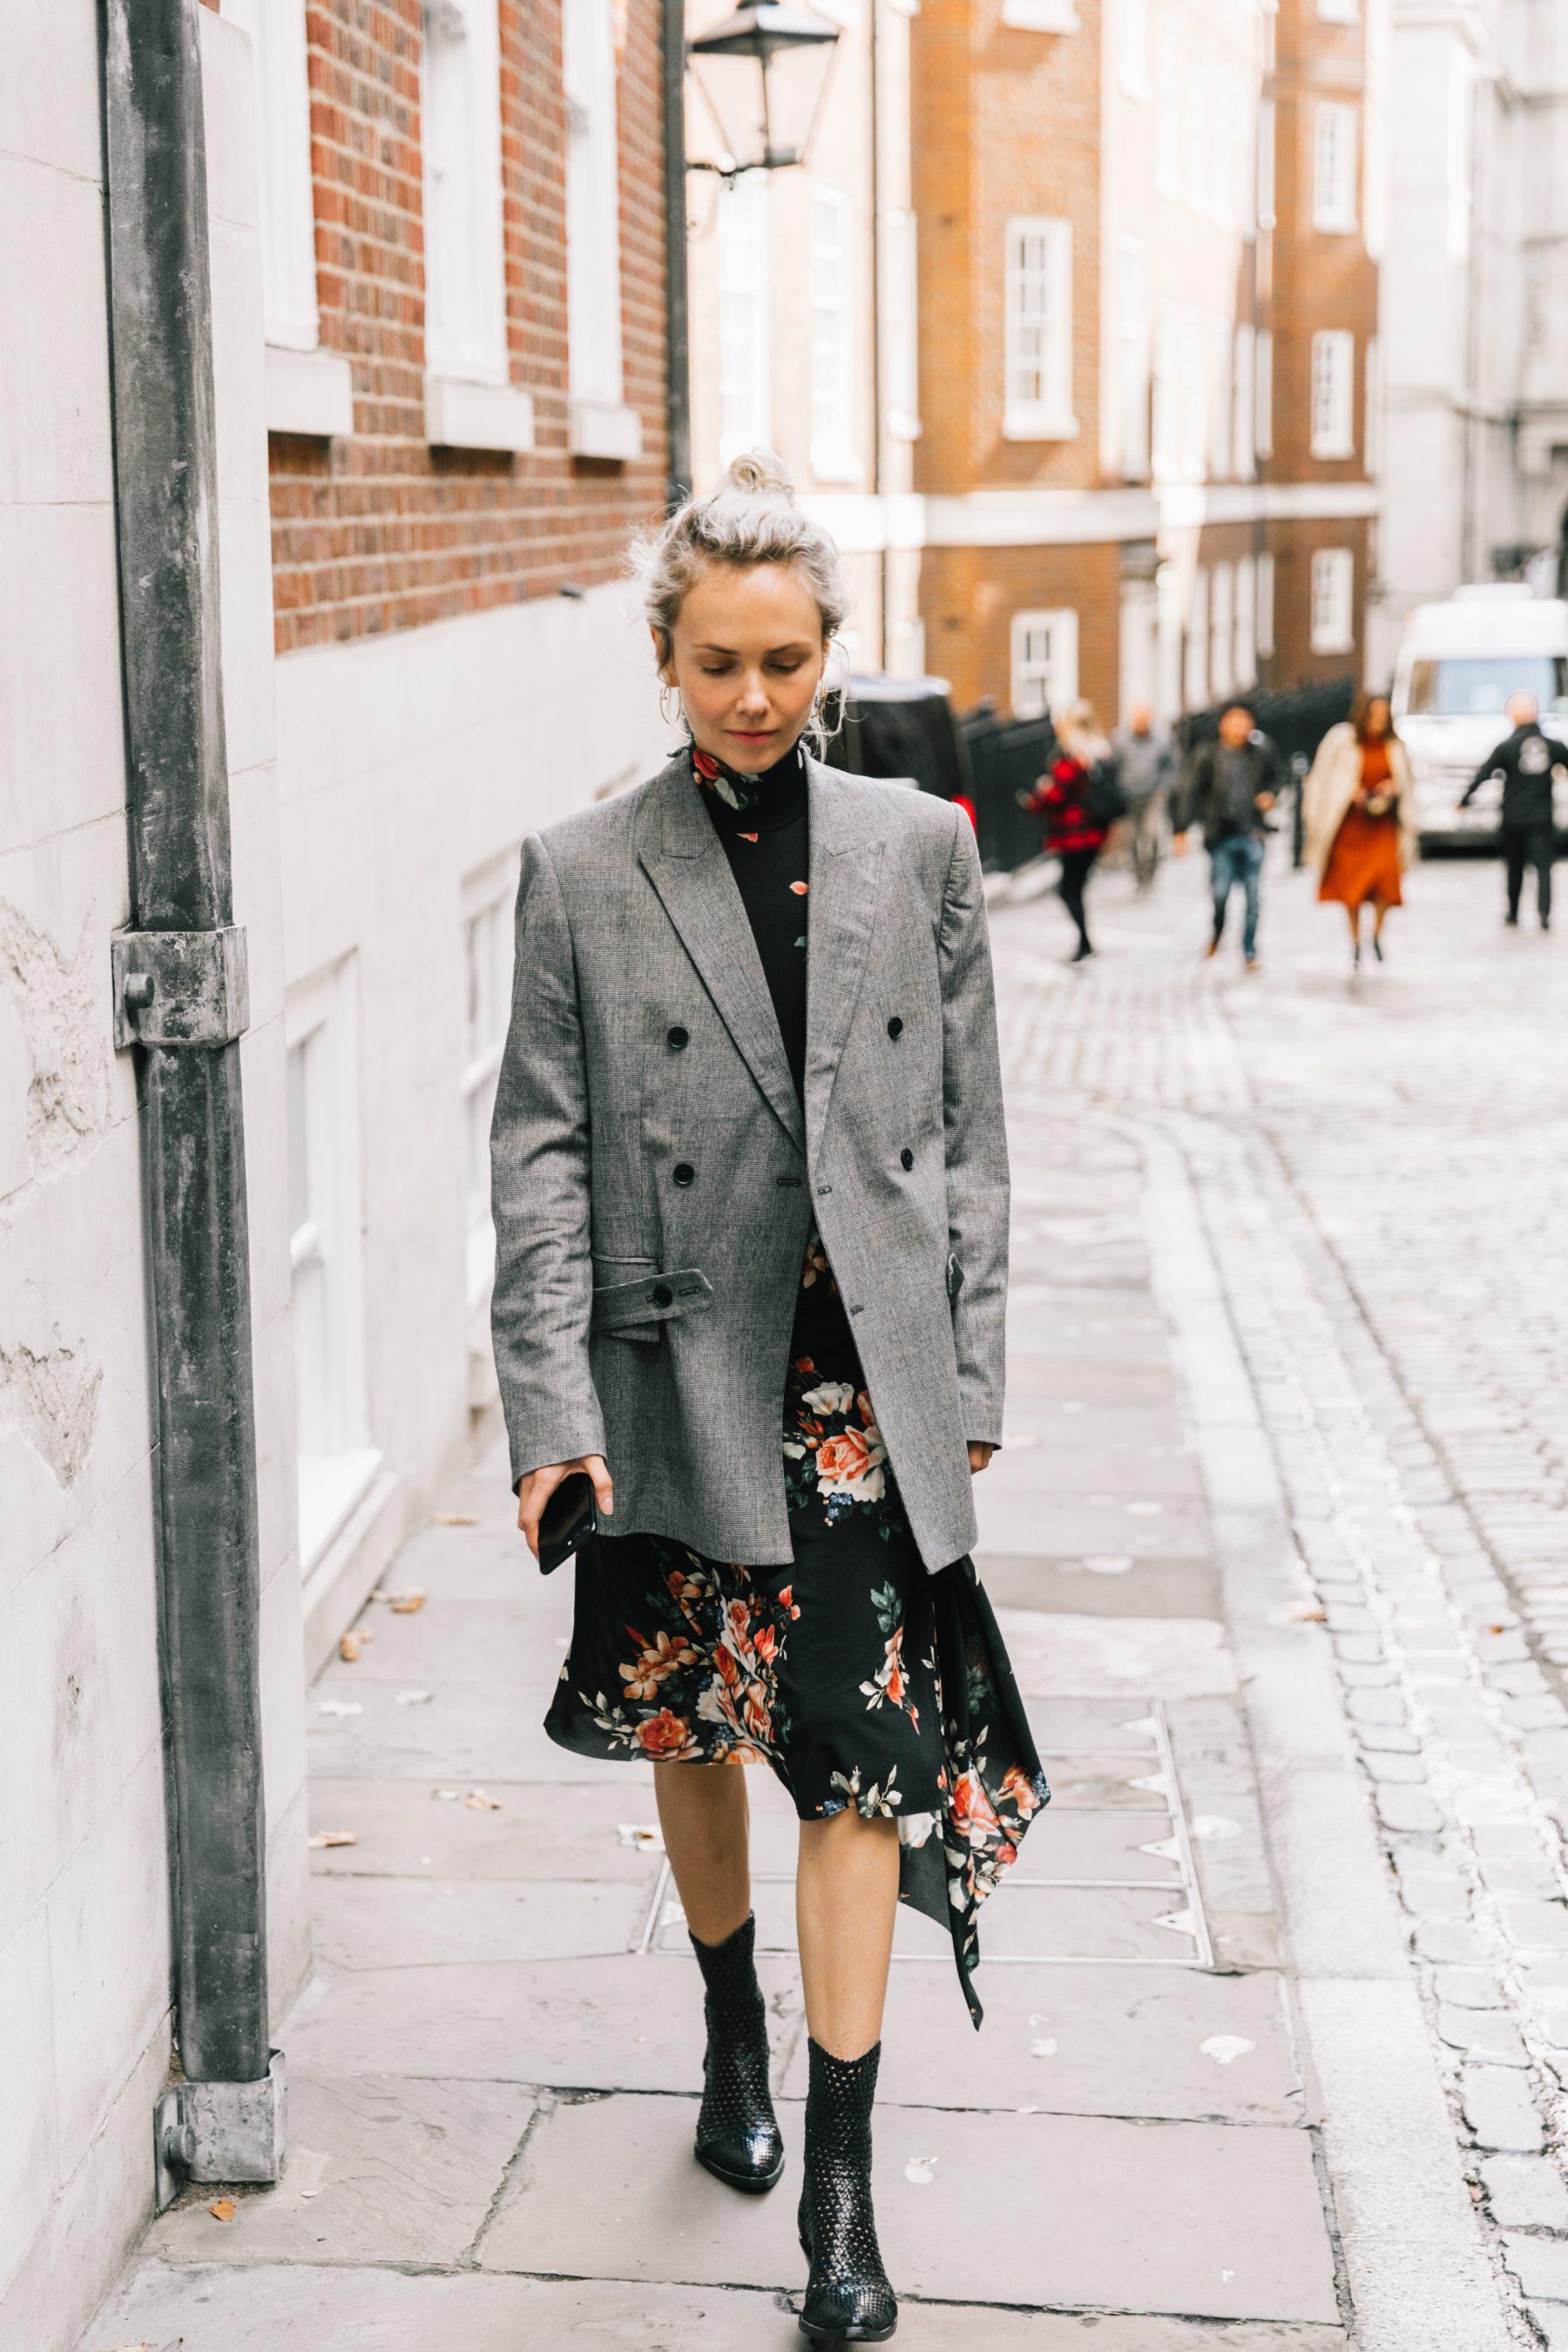 blazer đầm hoa đen tóc búi